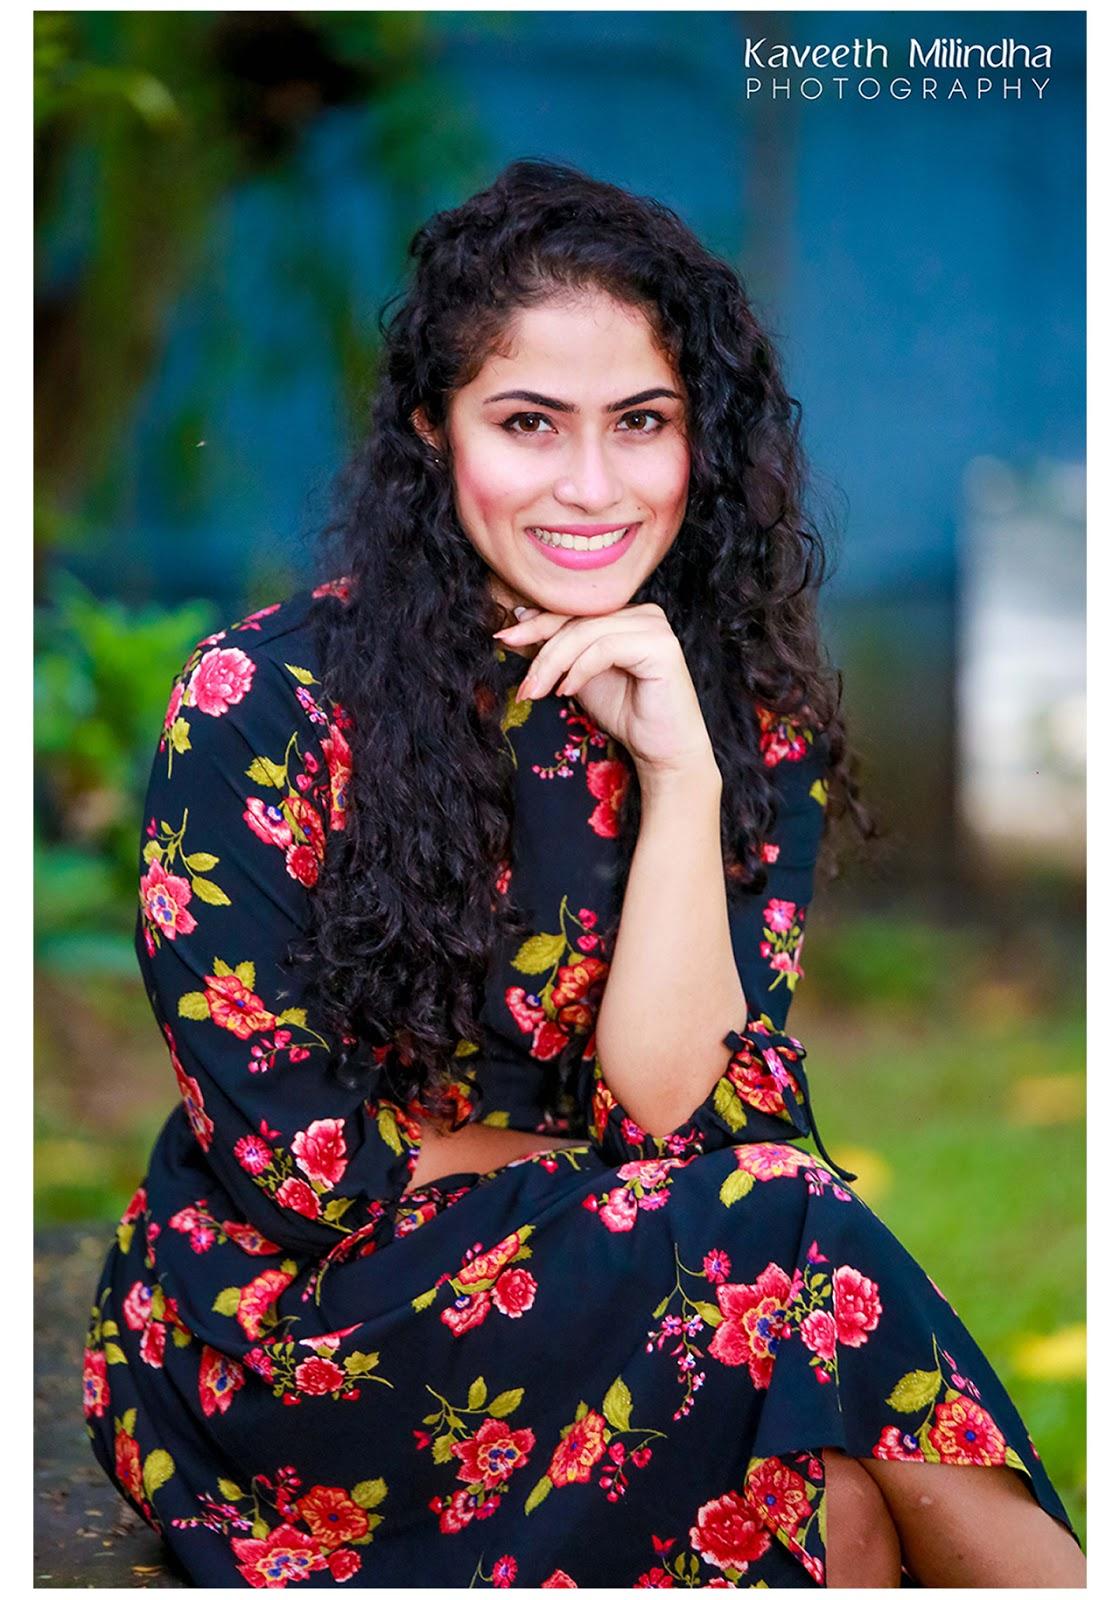 Sandani Fernando photoshoot 2019   CeylonFace - Actress